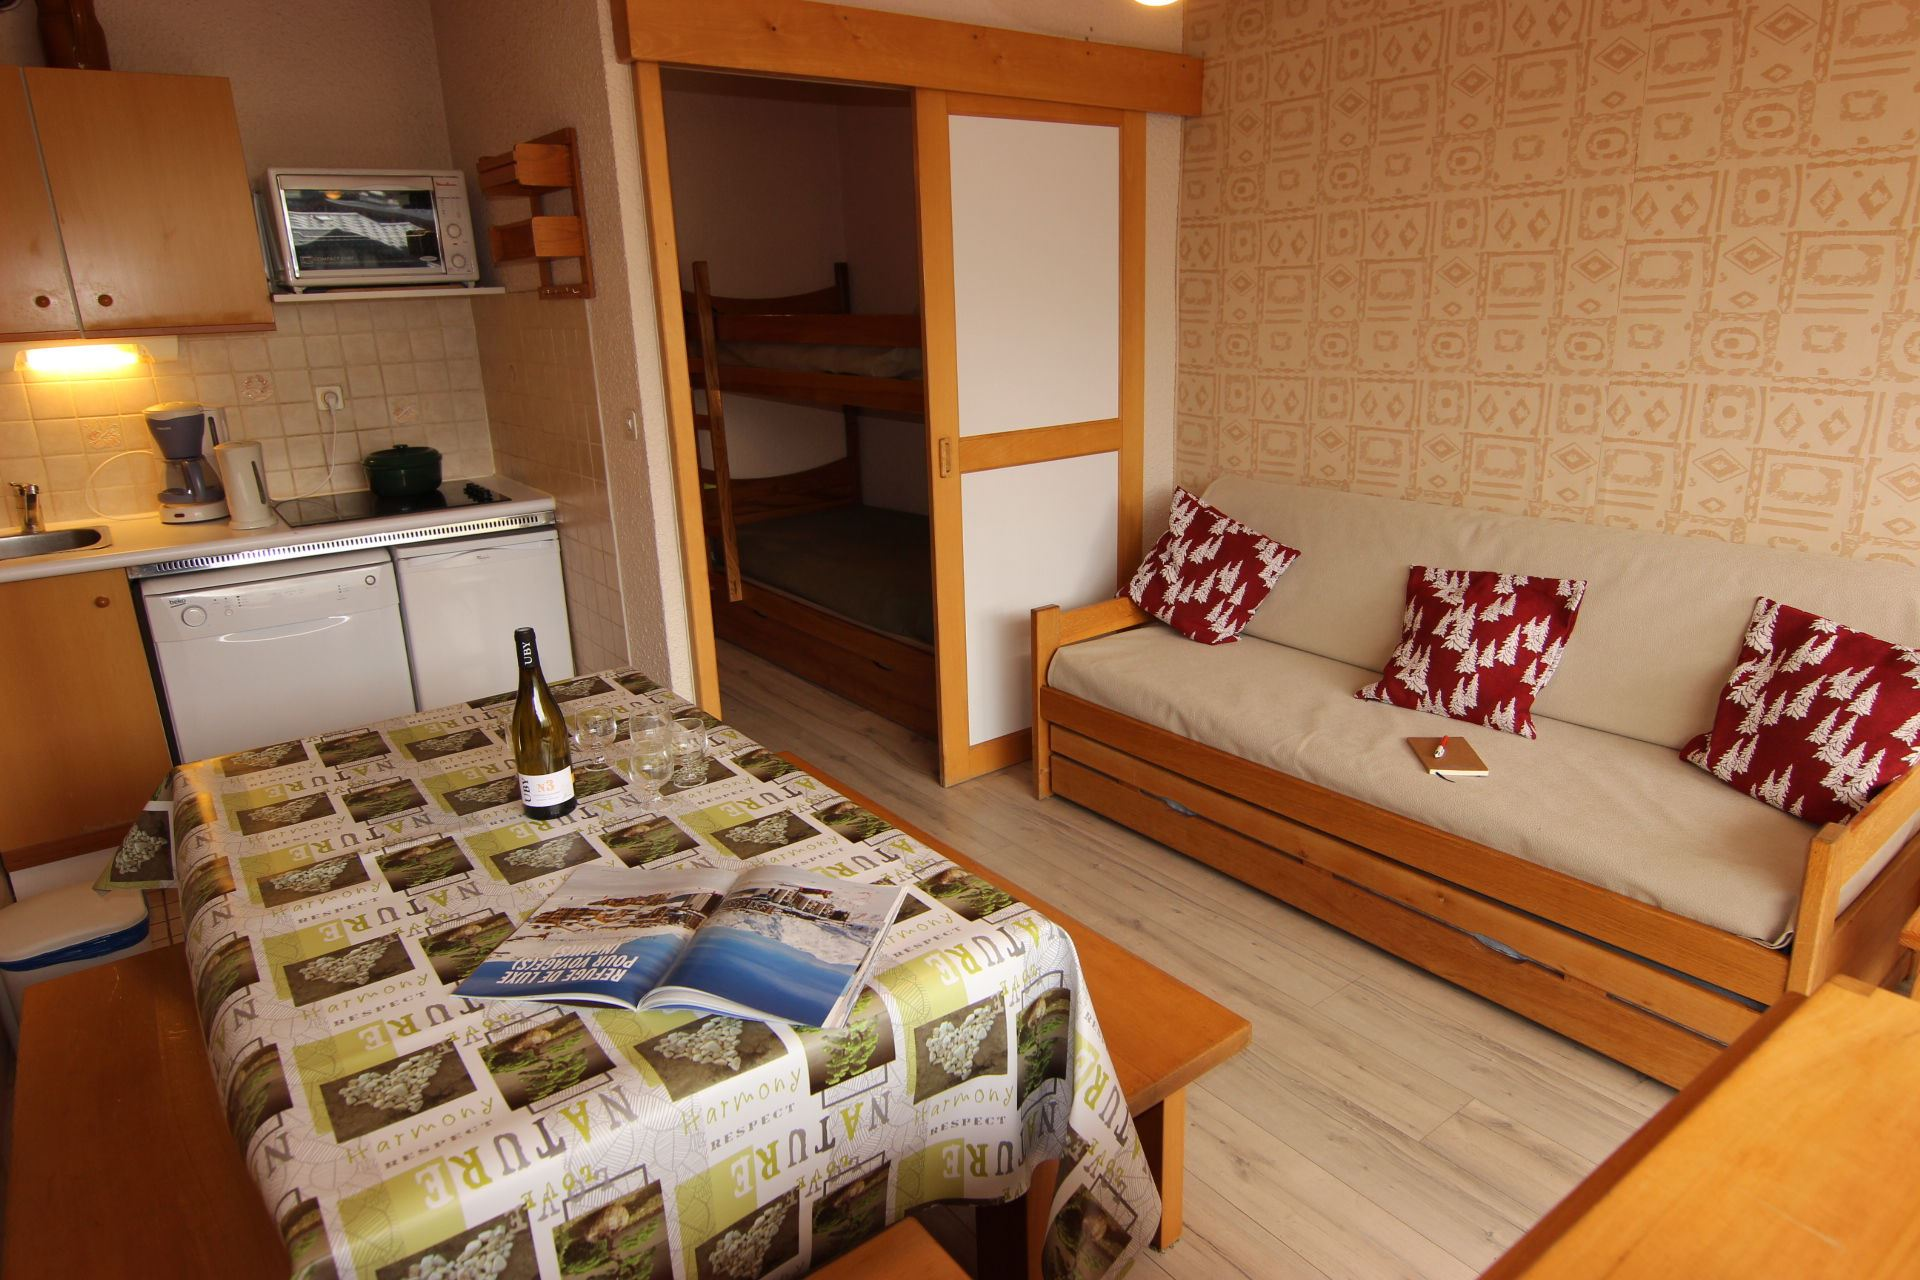 LAC DU LOU 307 / 2 ROOMS 6 PERSONS - 1 BRONZE SNOWFLAKE - VTI